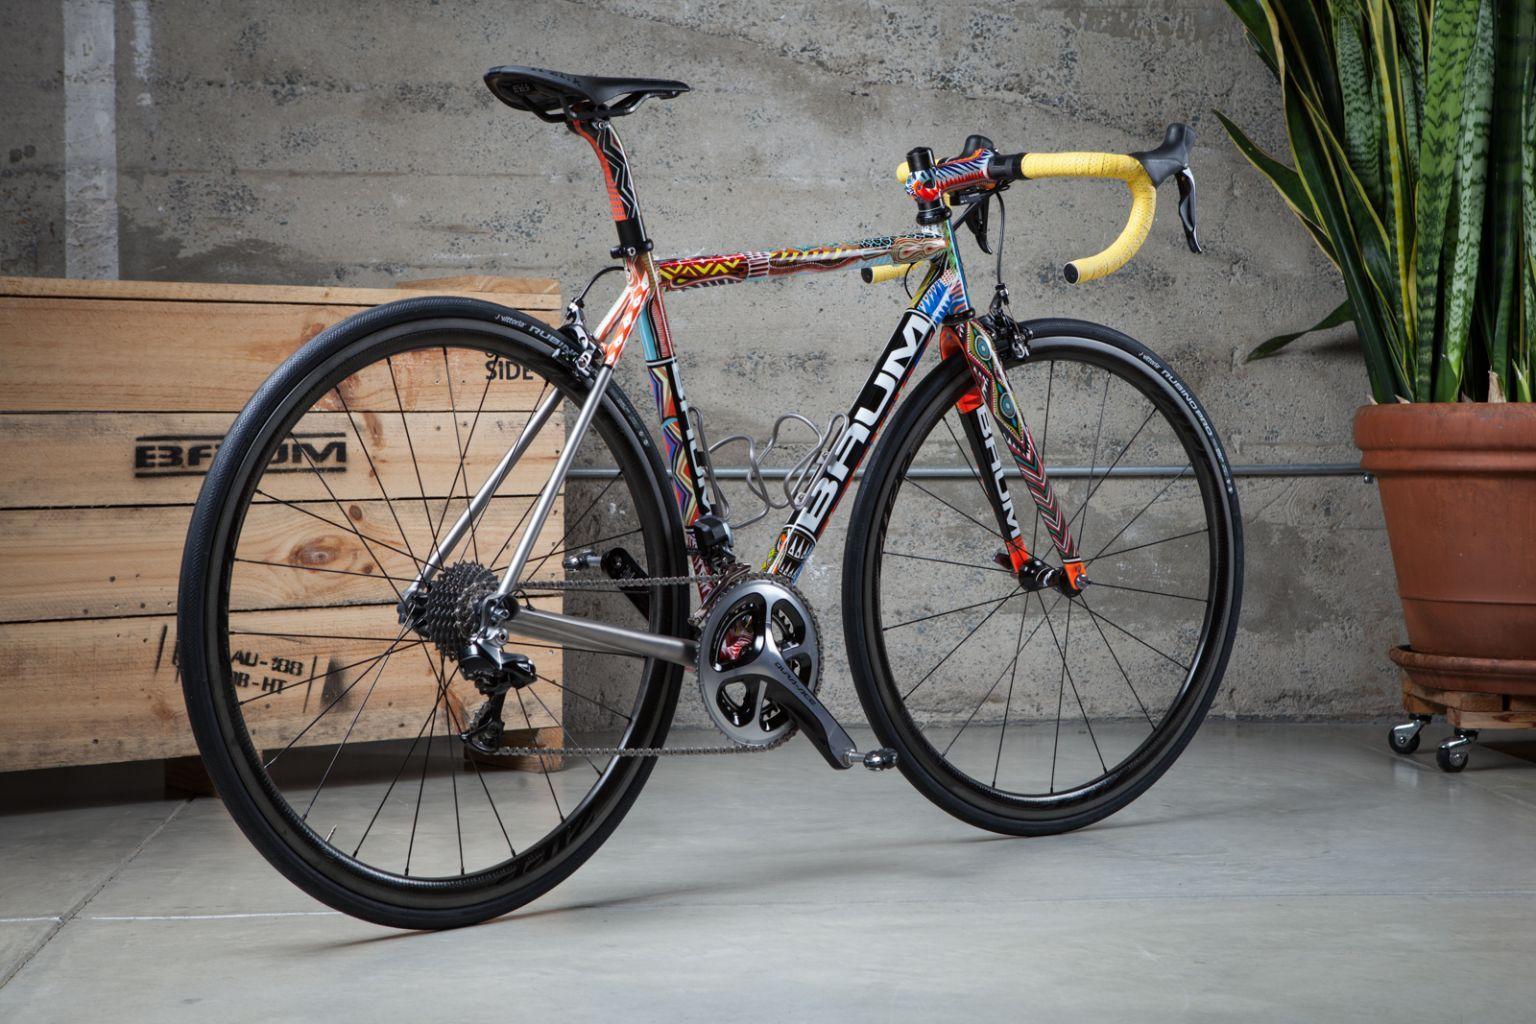 Img 1215 Edit Bike Frame Bike Kit Bicycle